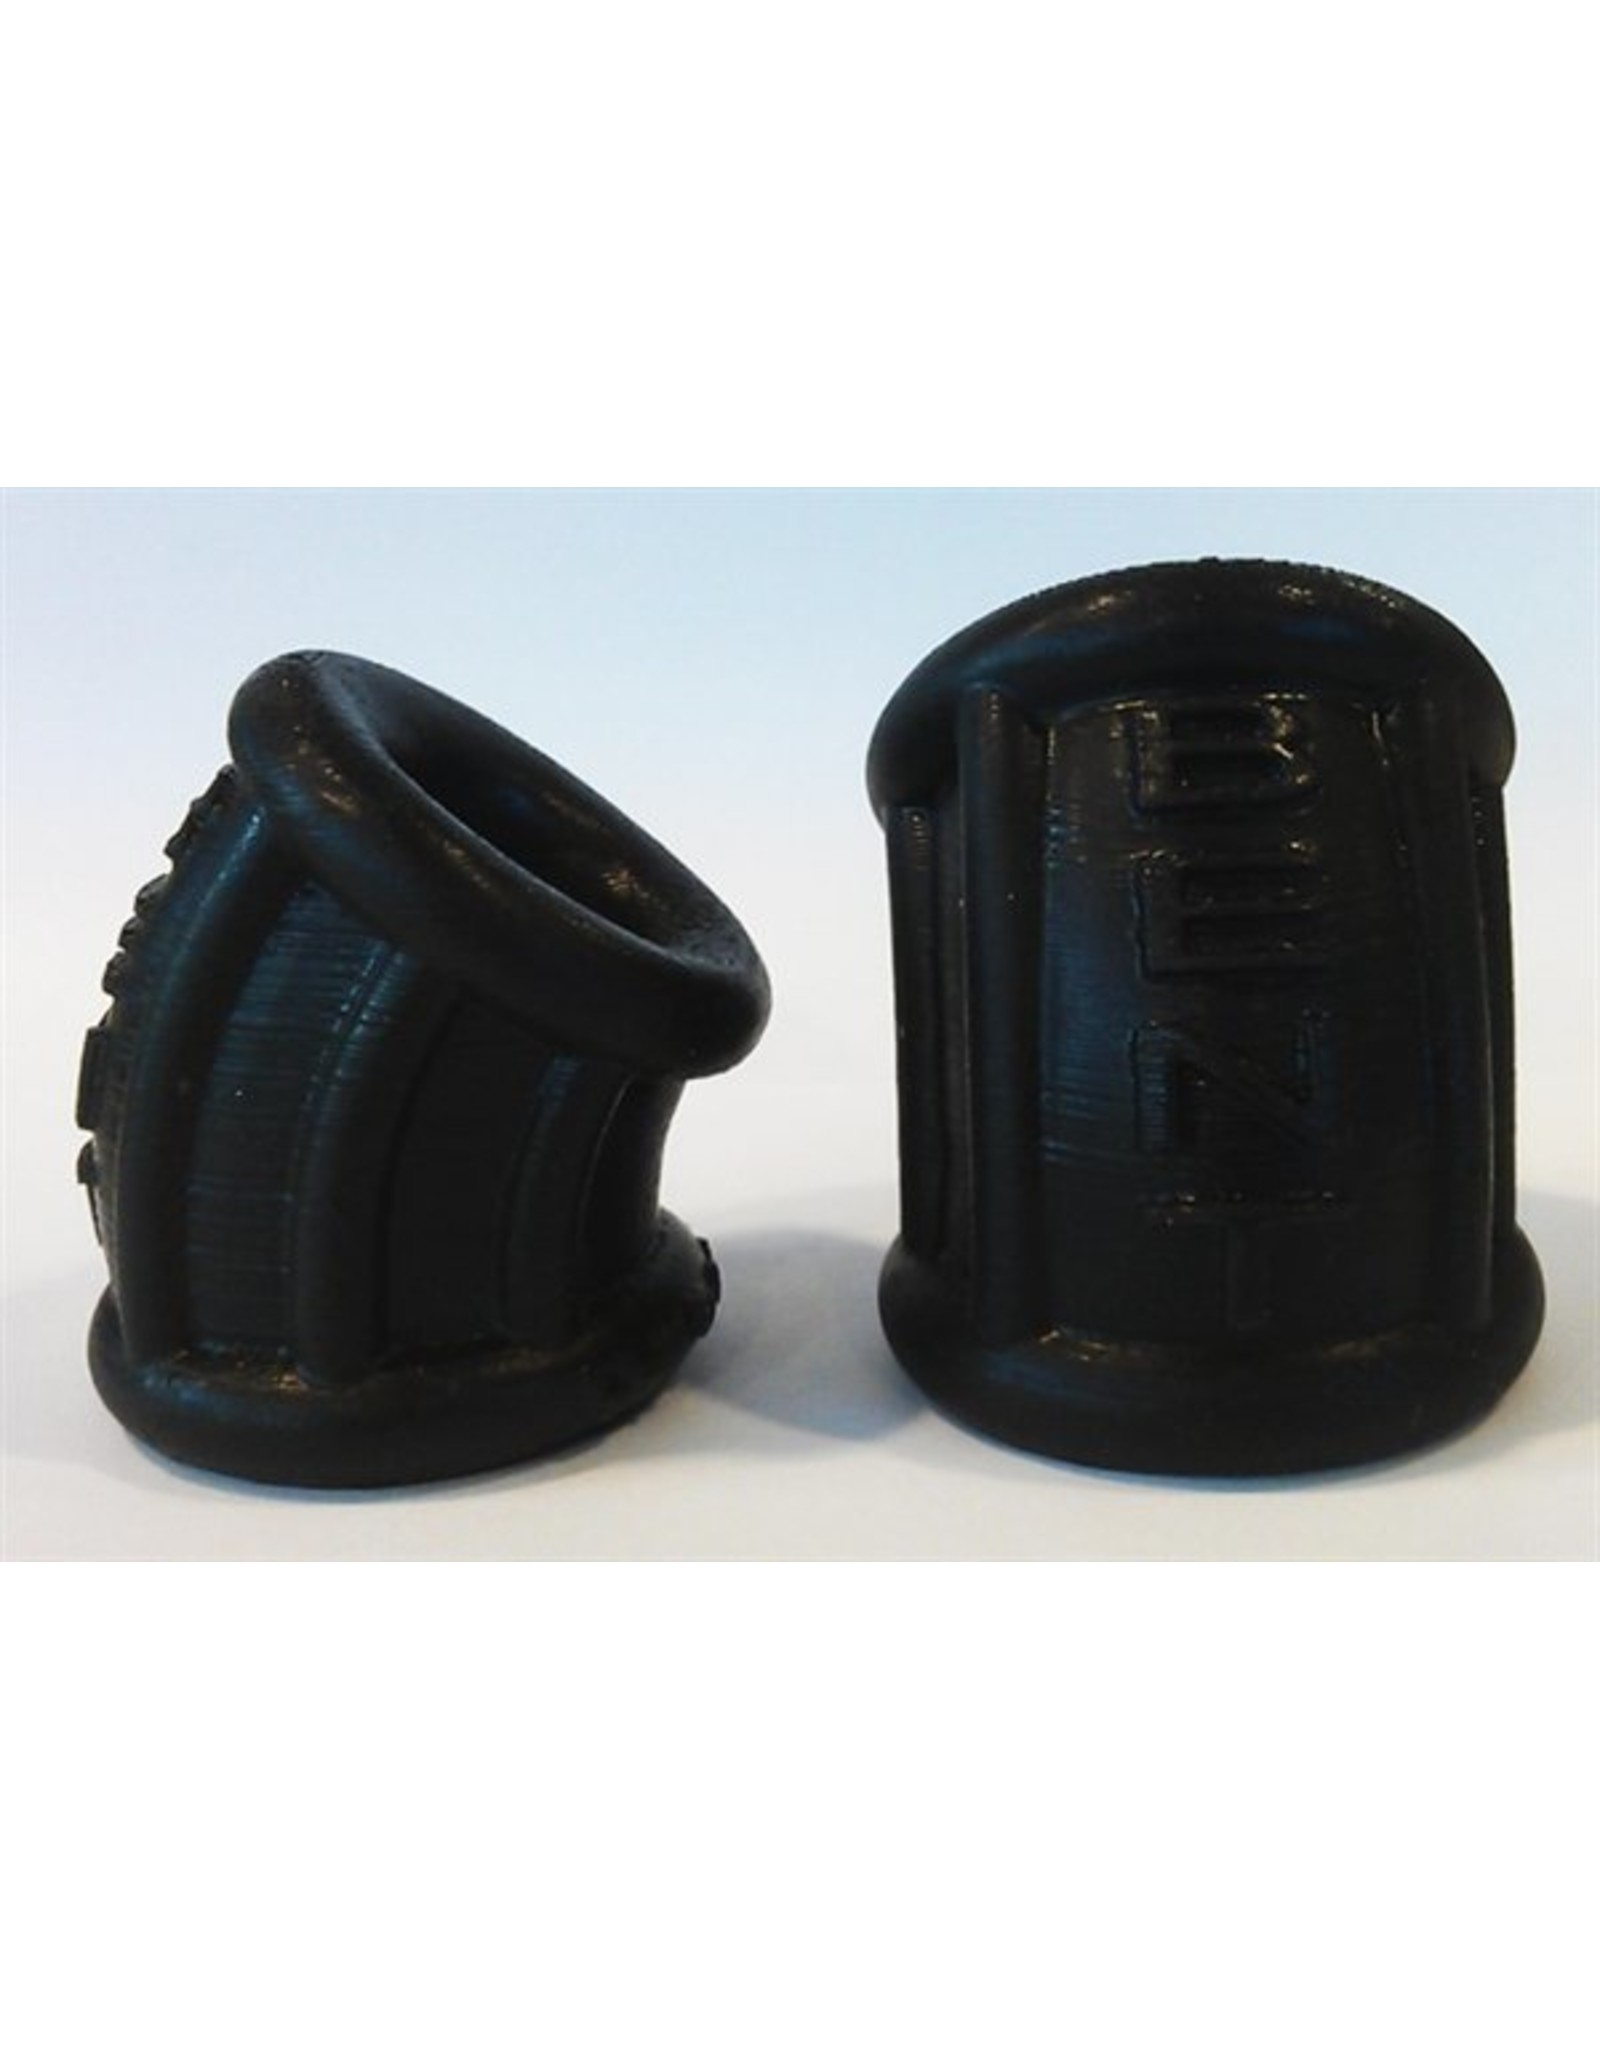 Bent-2 Ballstretcher Black large